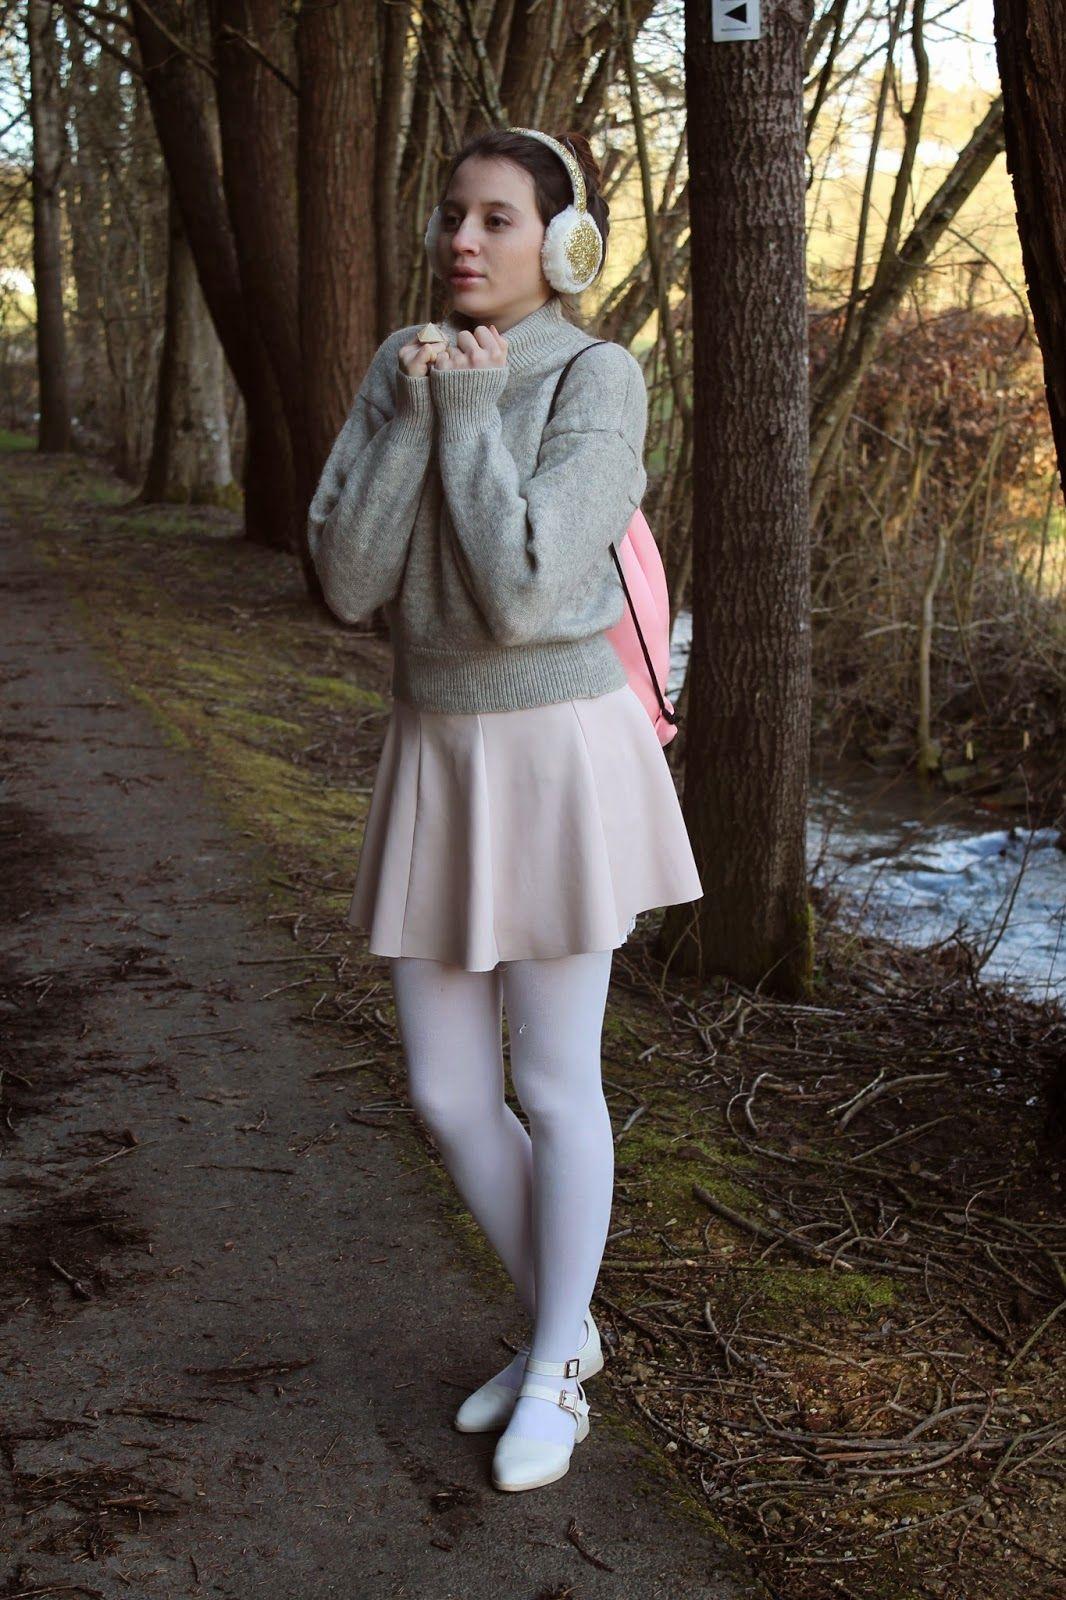 foto de The ultimate white tights inspiration Fashionmylegs